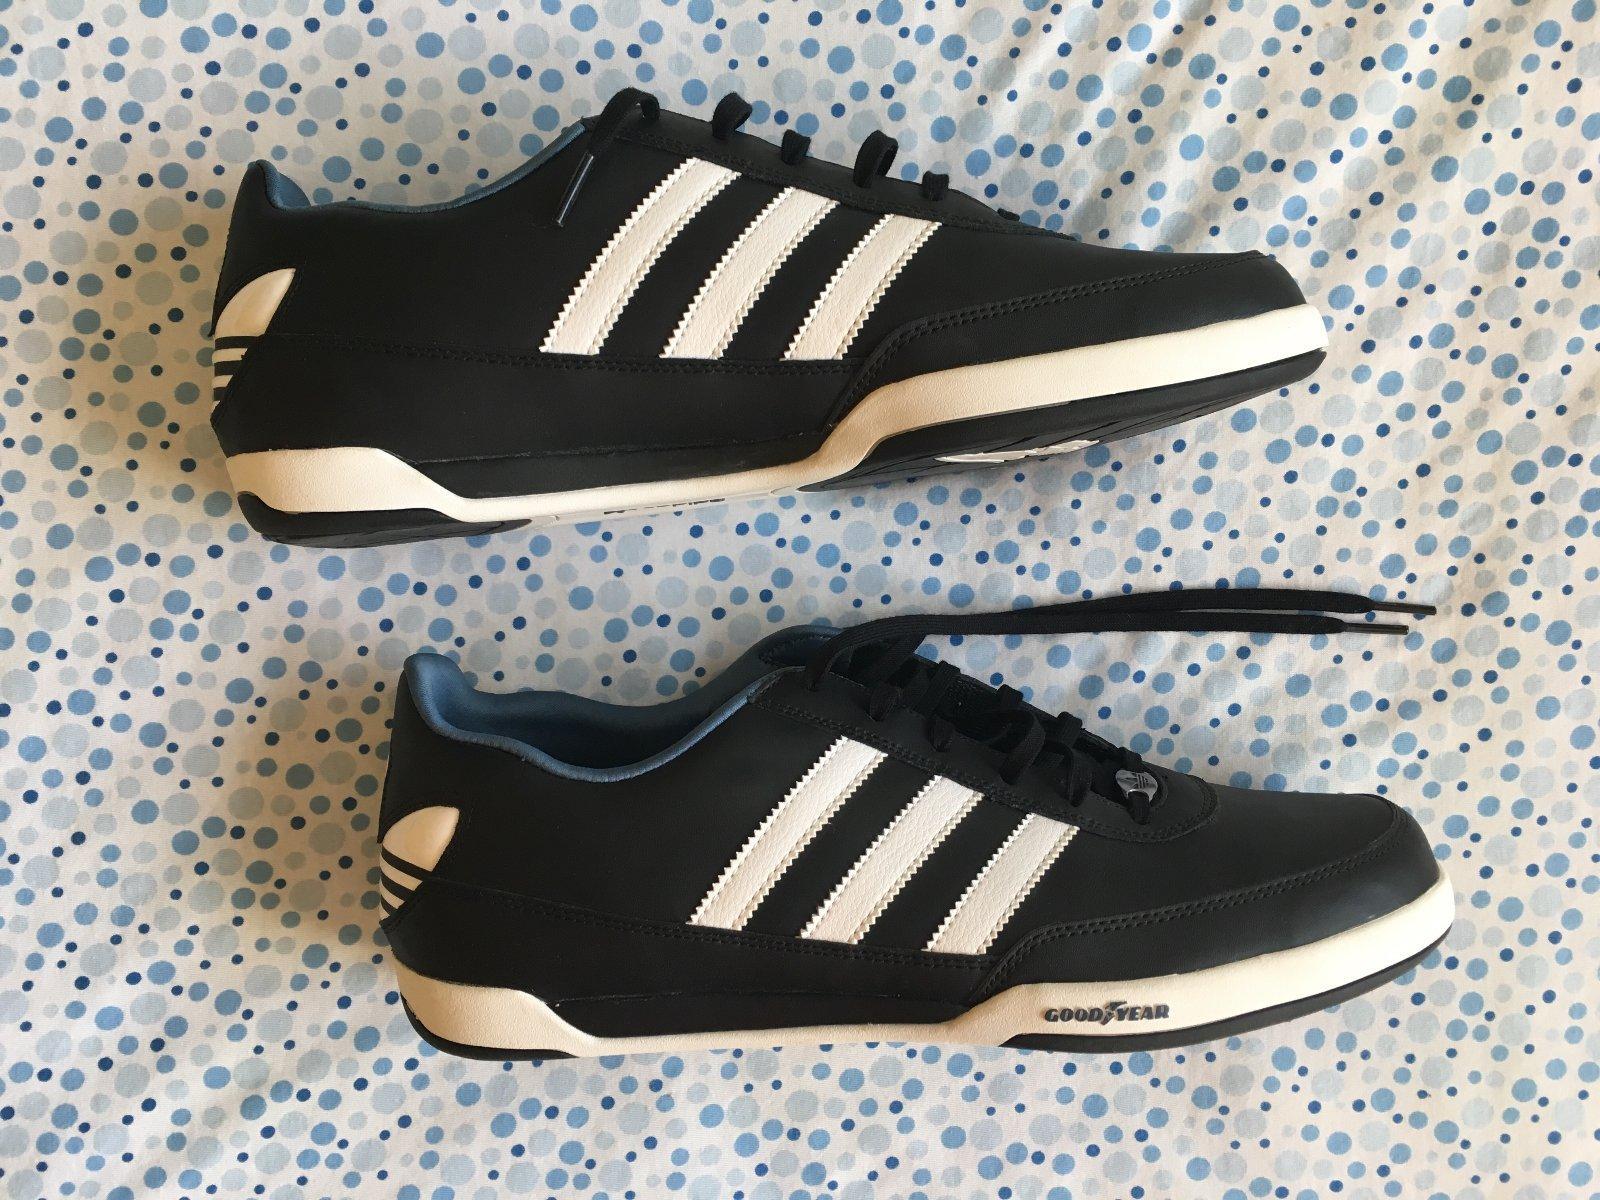 Nové tenisky adidas goodyear street veľk. 44 1dd53f9b239